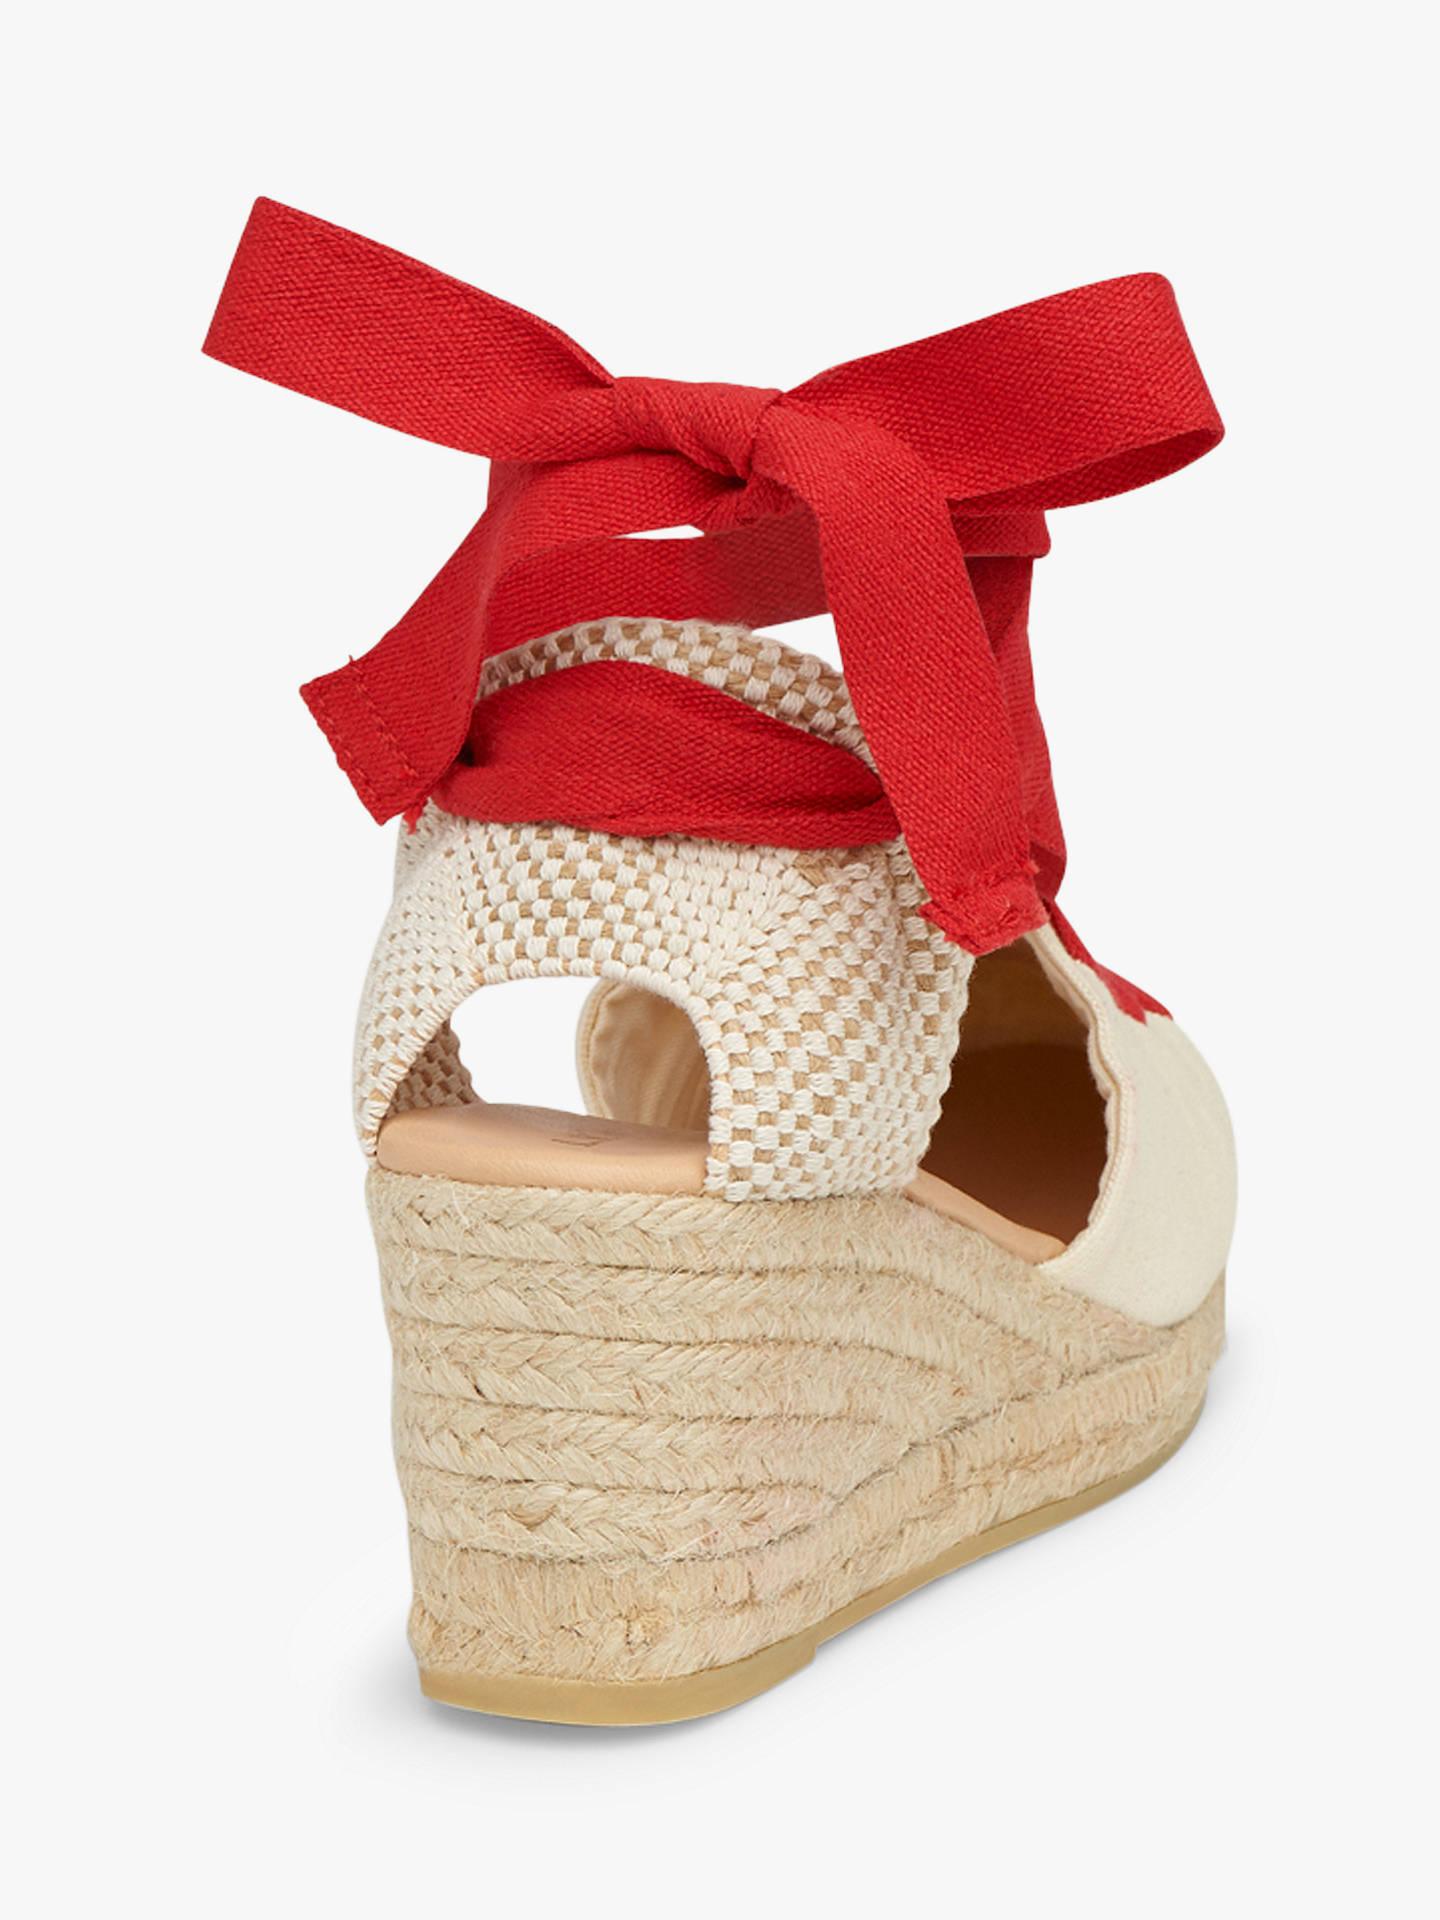 78cd5bb5f48 L.K.Bennett Martha Wedge Heel Sandals at John Lewis & Partners